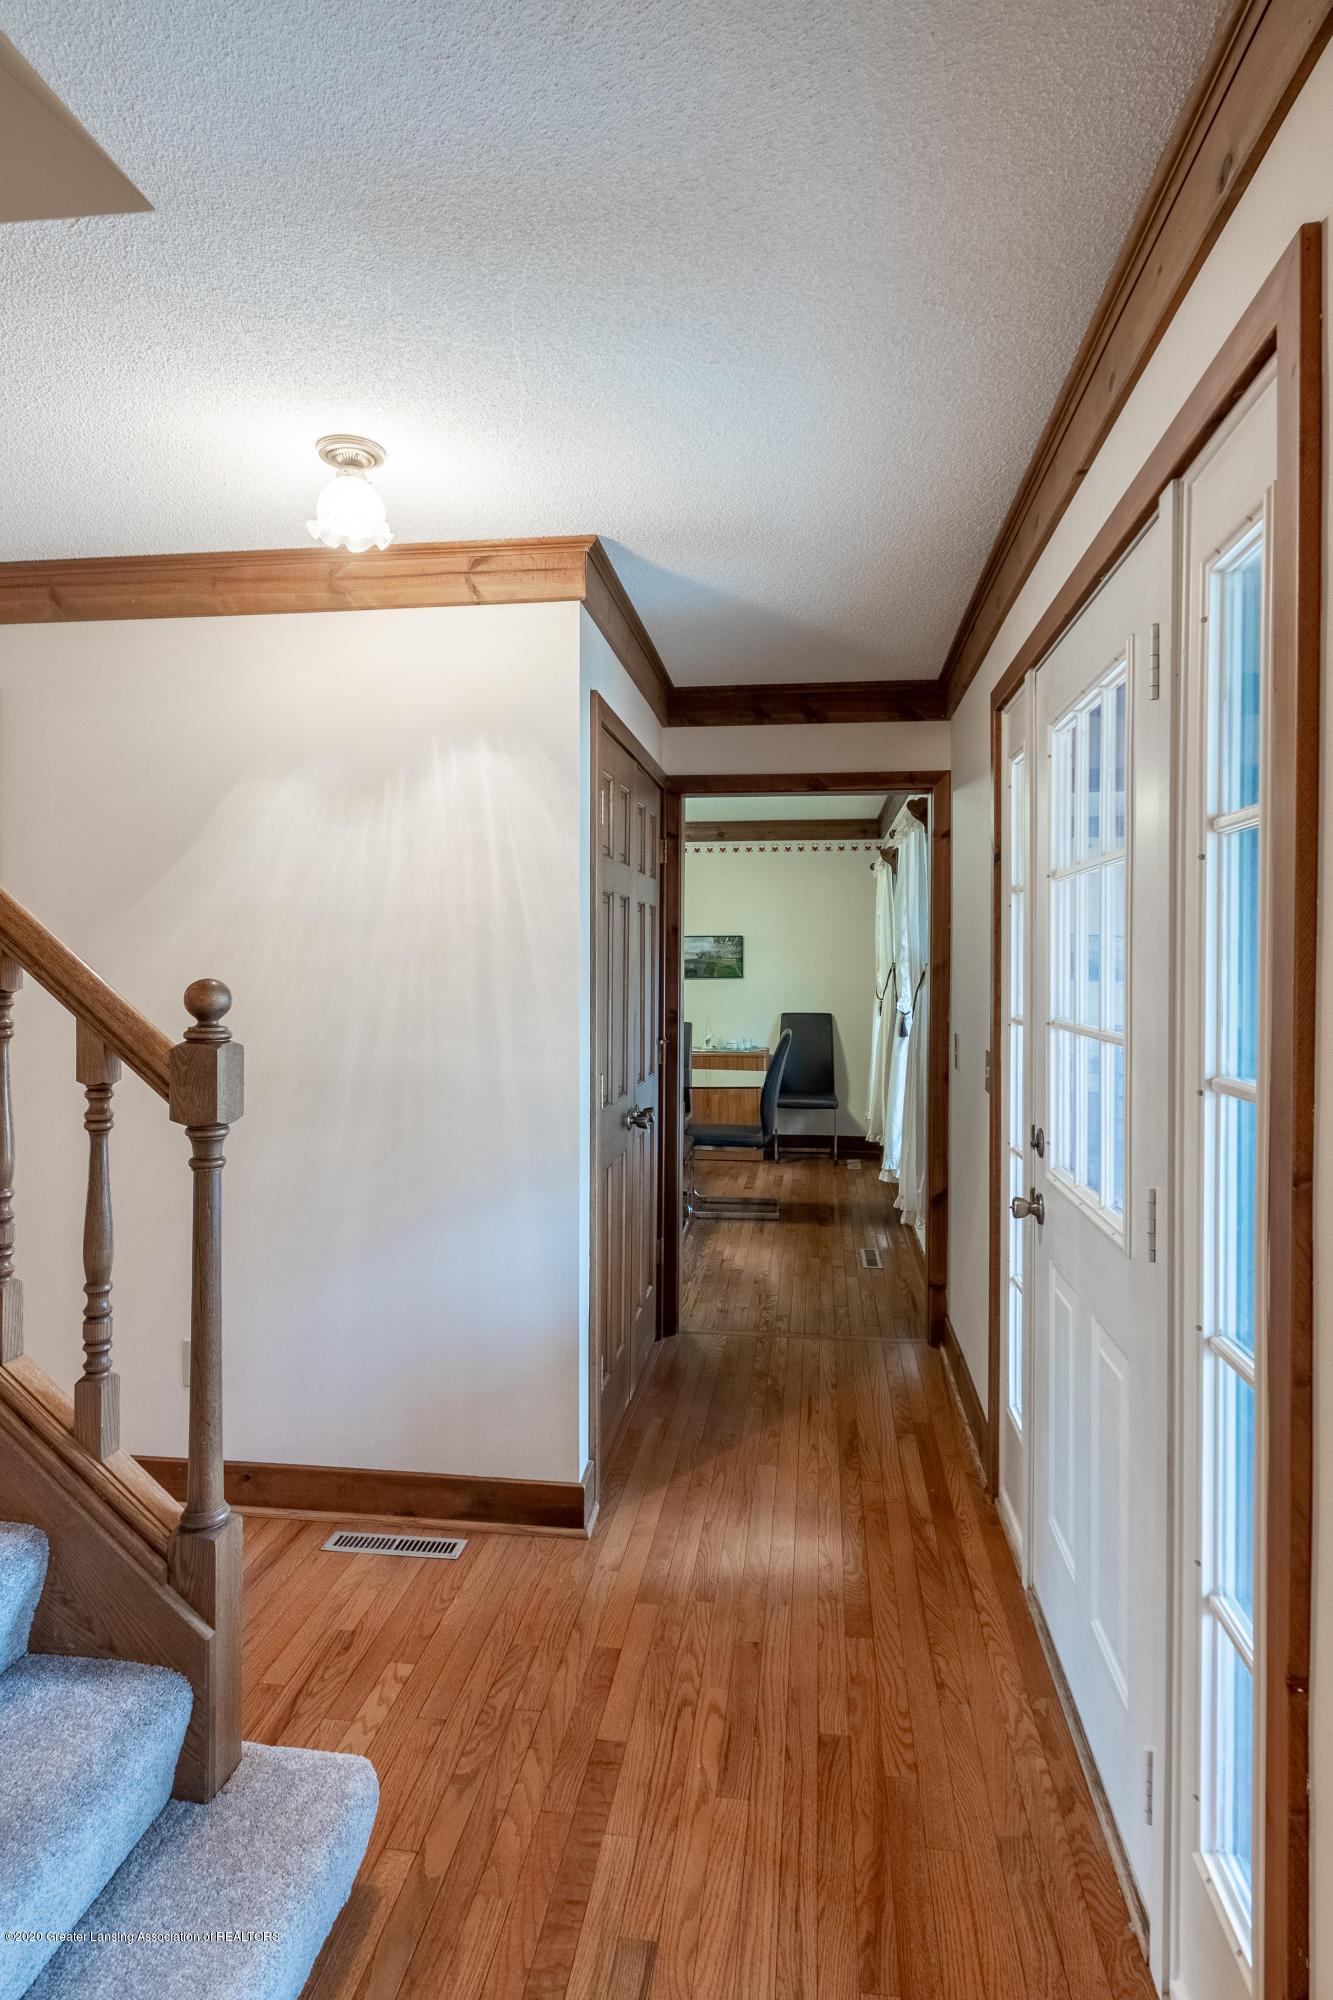 3945 Breckinridge Dr - Foyer - 9